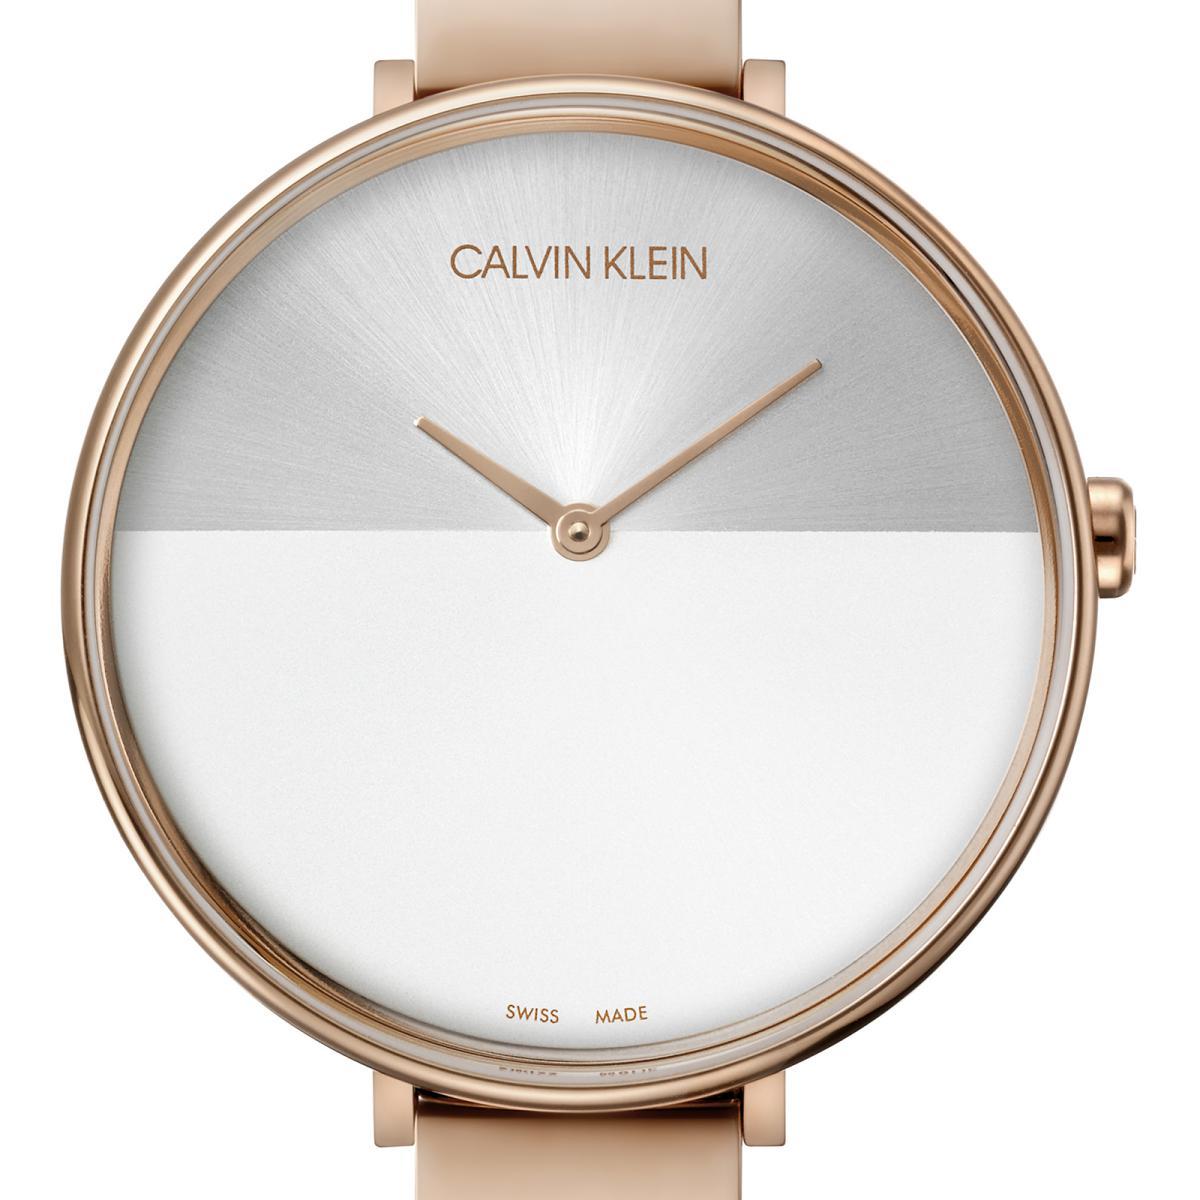 gran descuento obtener nueva bajo precio Reloj CALVIN KLEIN - K7A23646 - Mujer - K7A23646 - Time Square